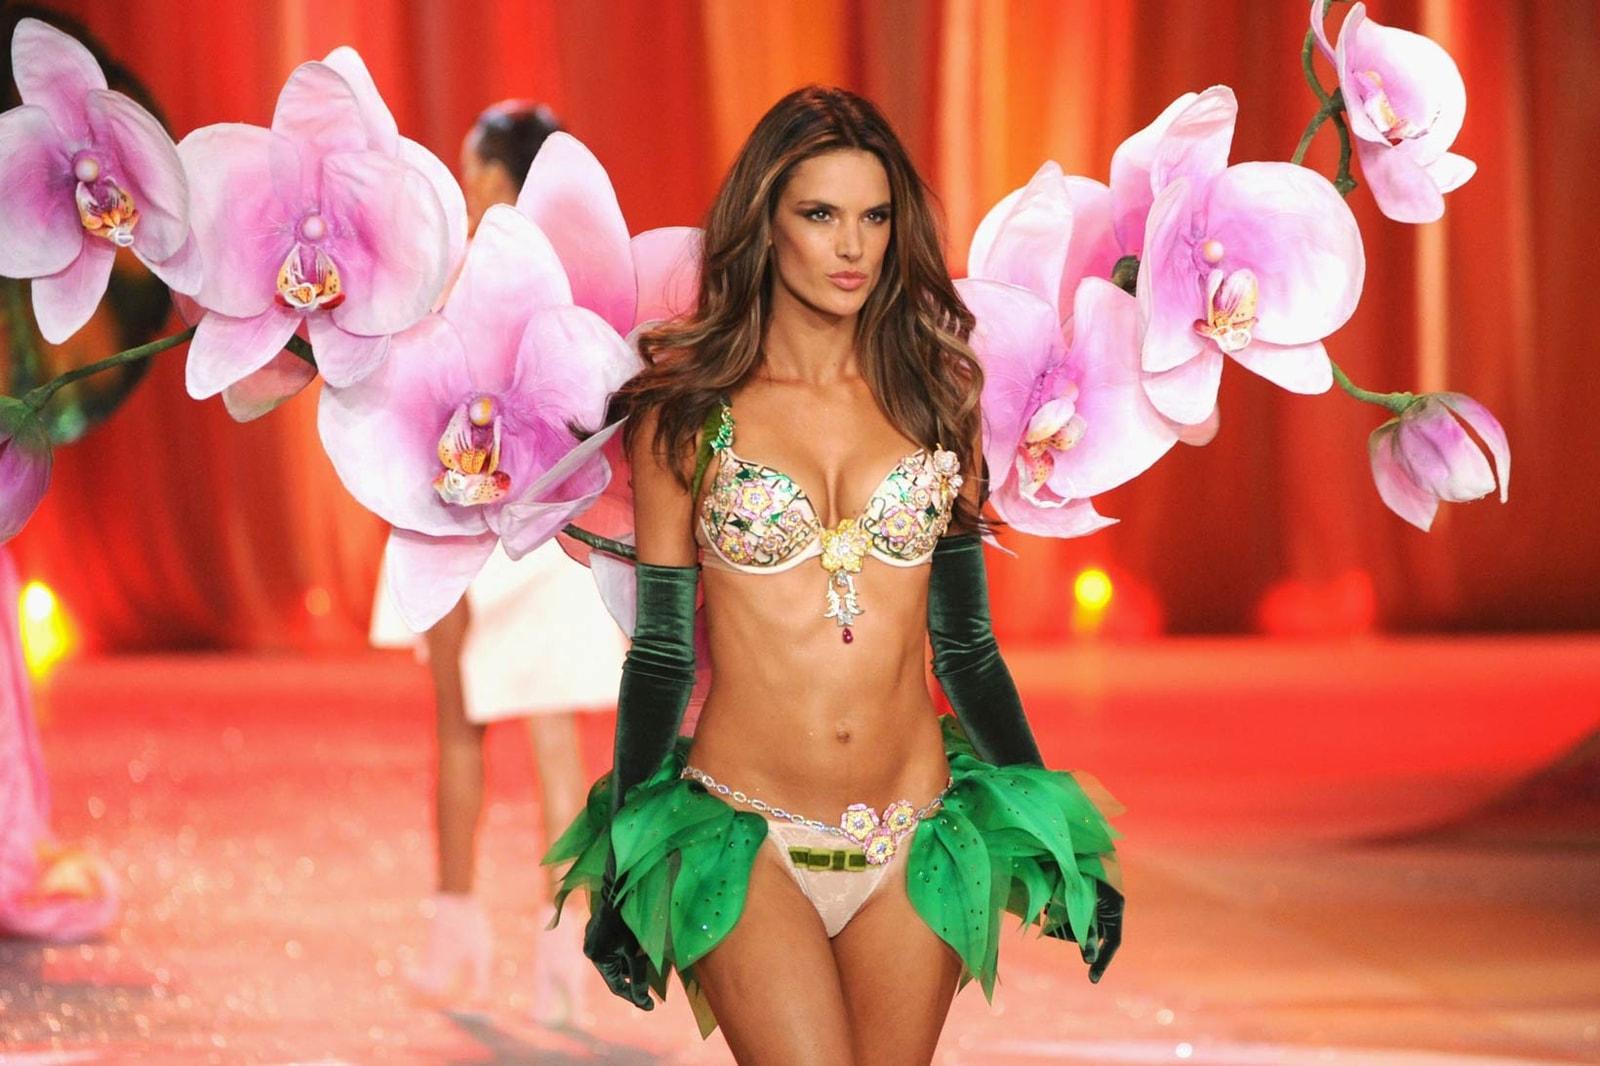 ANGELS Victoria's Secret Lookbook Russell James